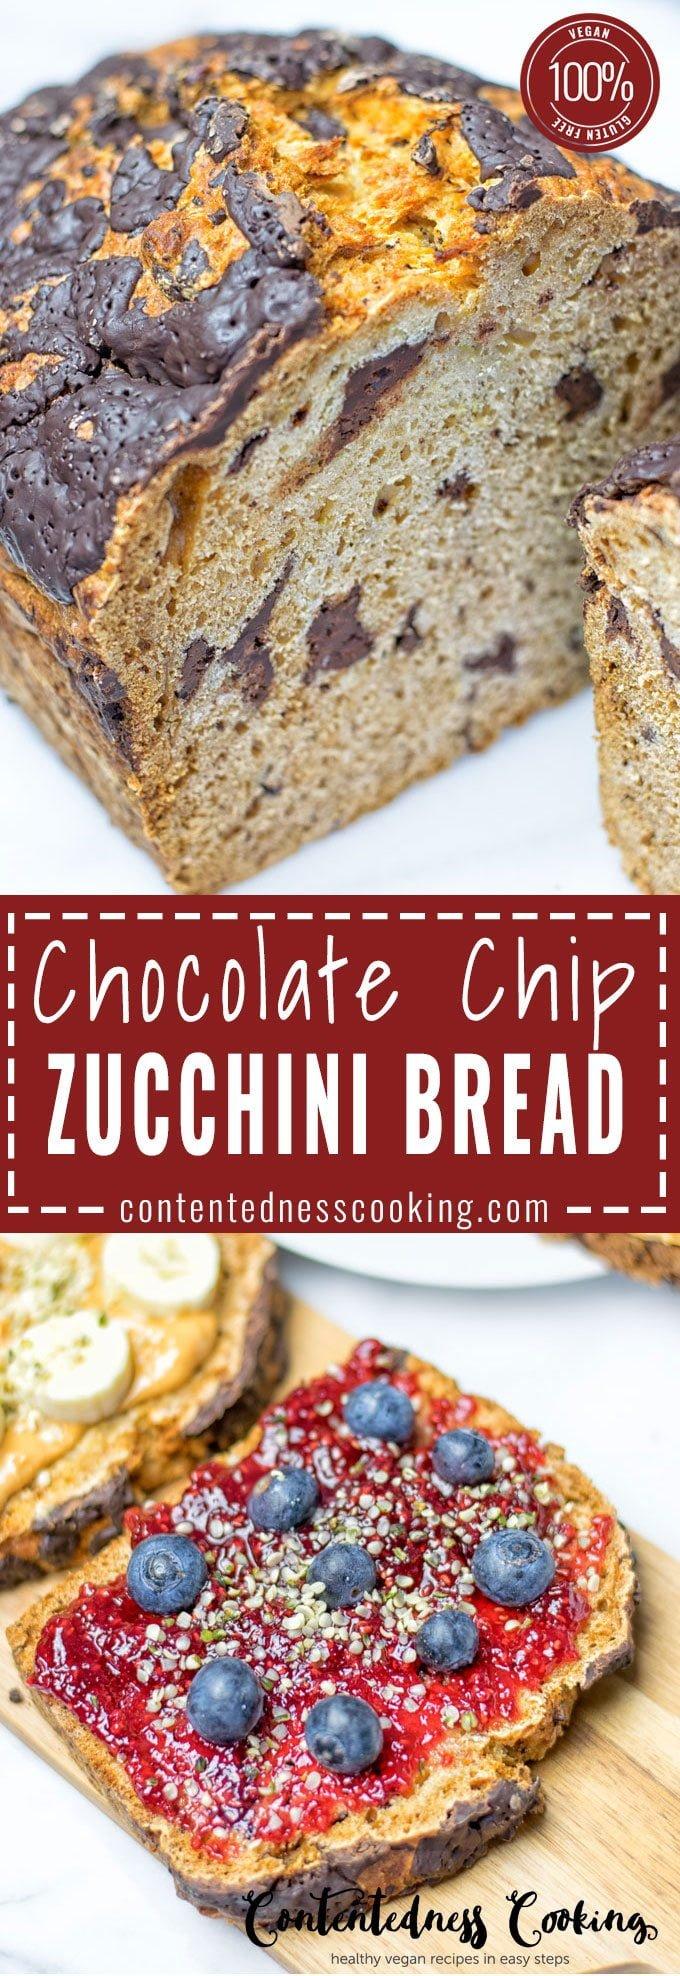 Chocolate Chip Zucchini Bread | #vegan #glutenfree #contentednesscooking